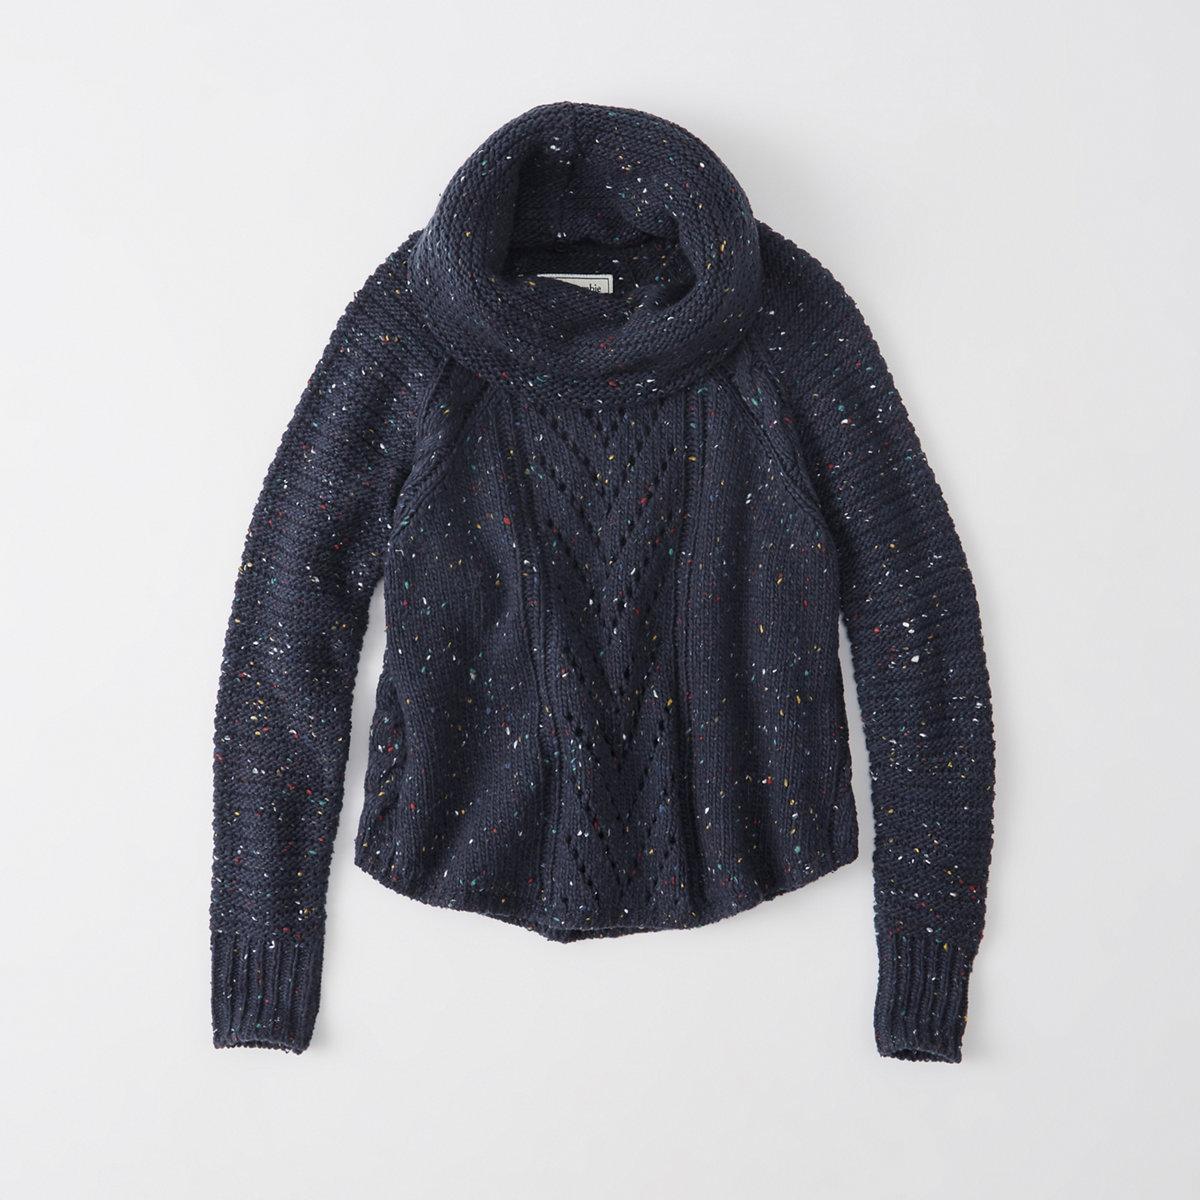 Convertible Turtleneck Sweater